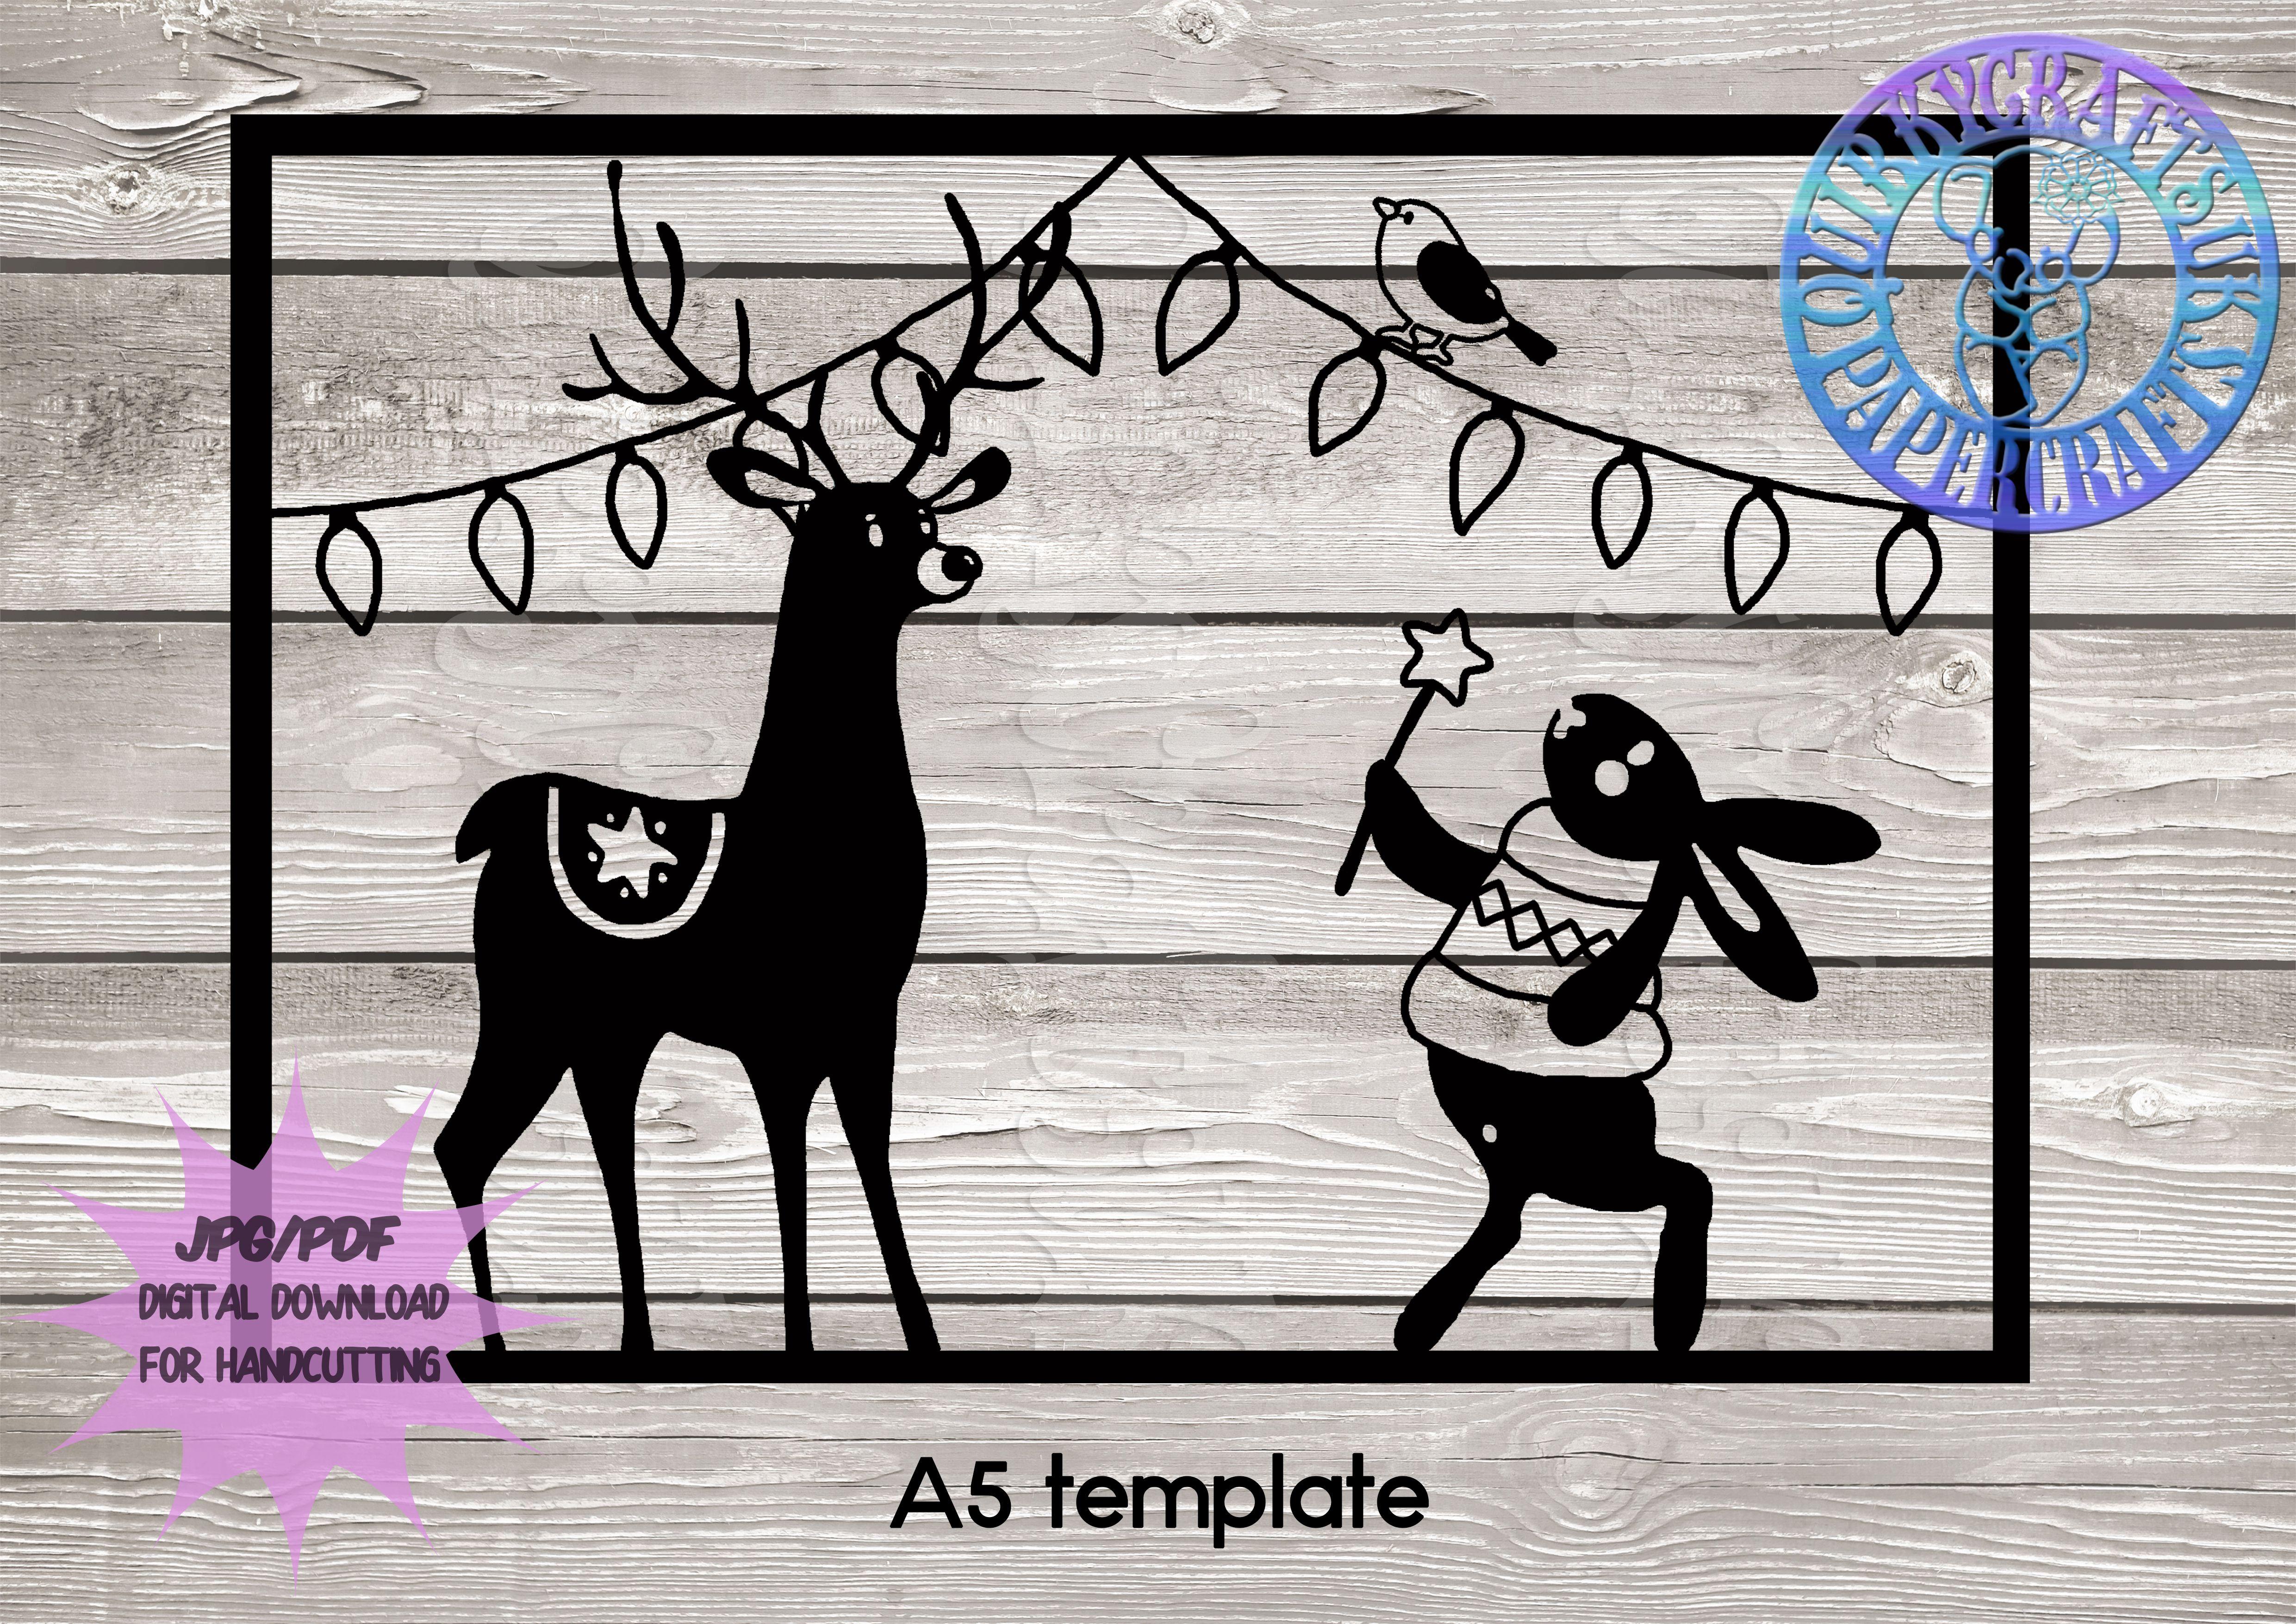 robin card xmas quirkycraftsuk polar mistletoe and greetings deer star bird decorations merry christmas qcuk lights bear making